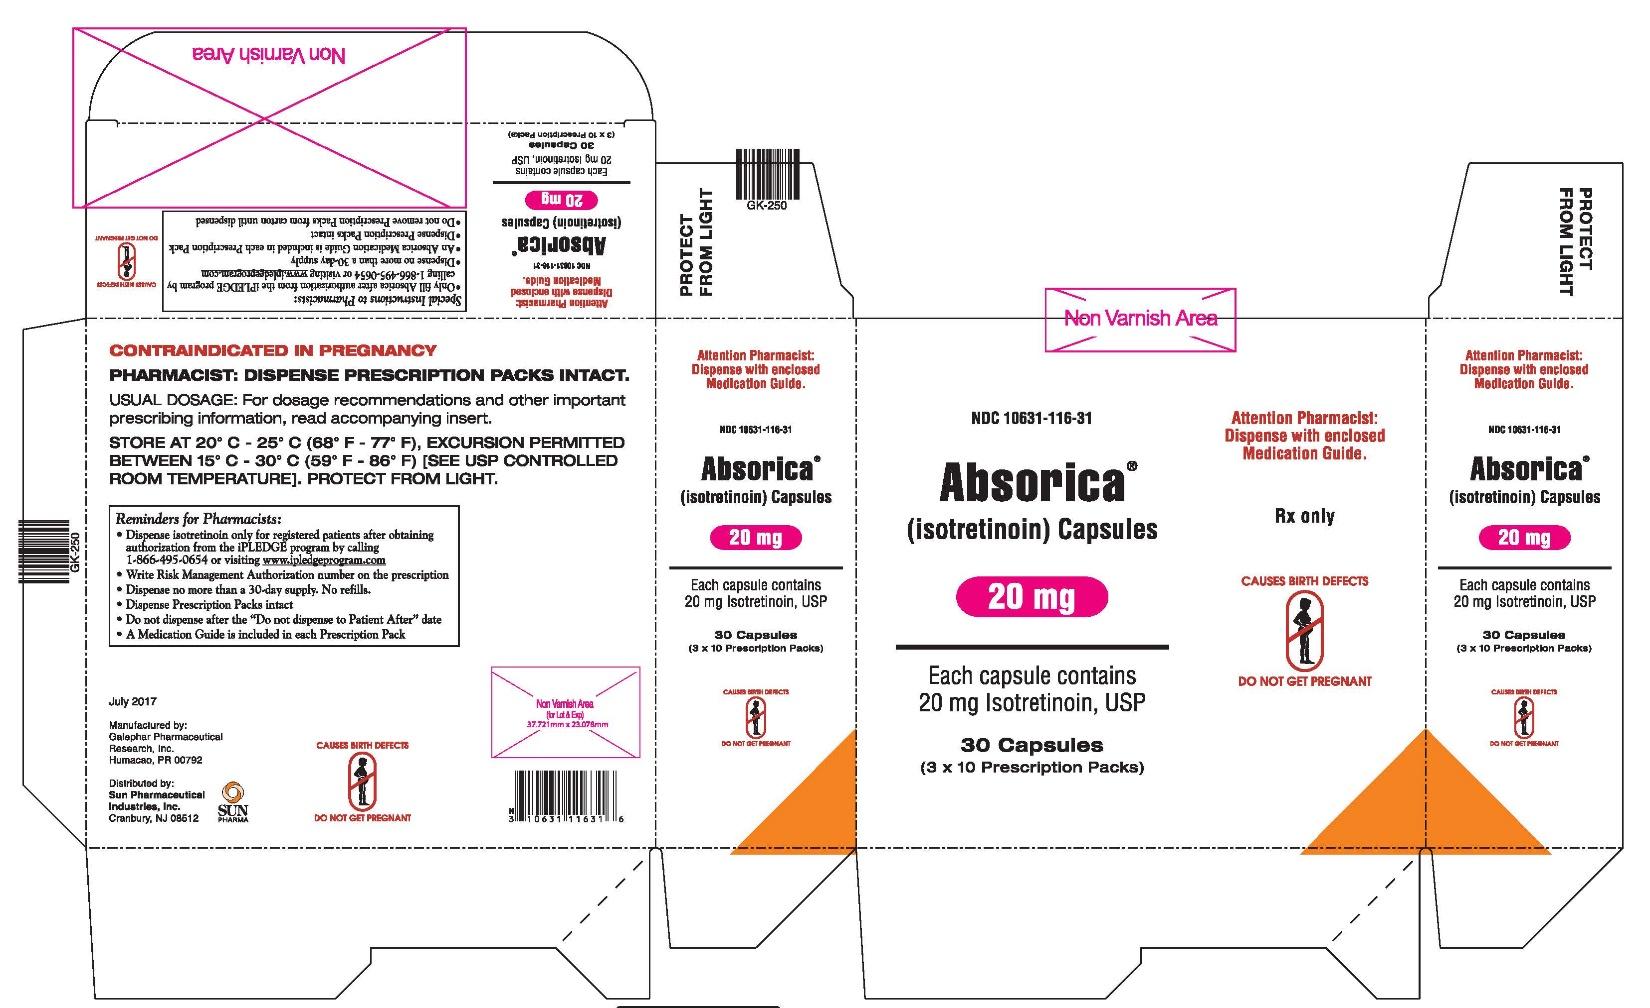 Absorica 20 mg Carton